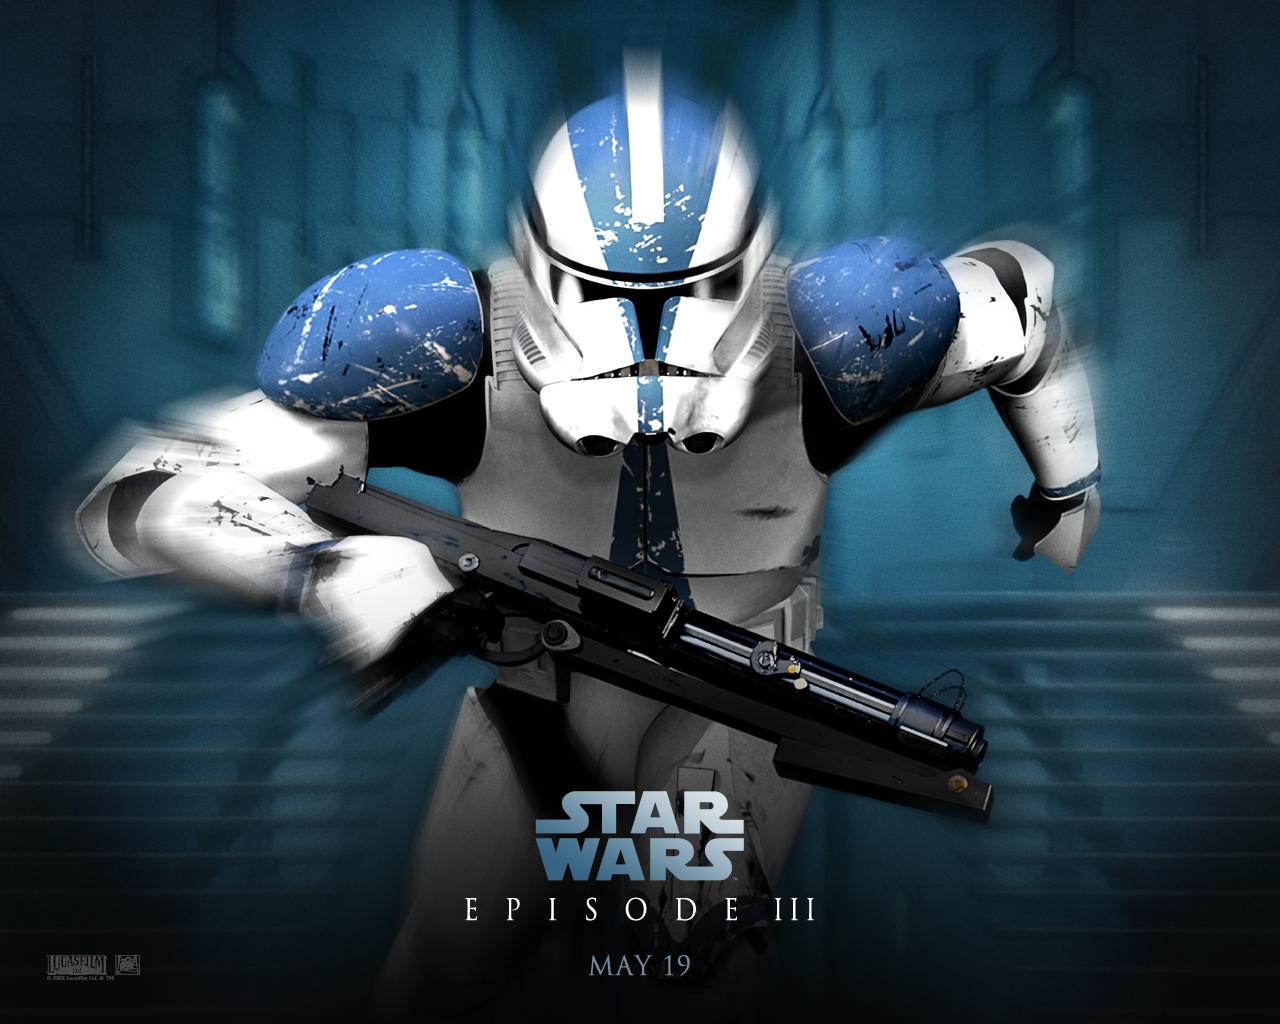 Star wars wallpaper hd 1080p iconos   Taringa 1280x1024